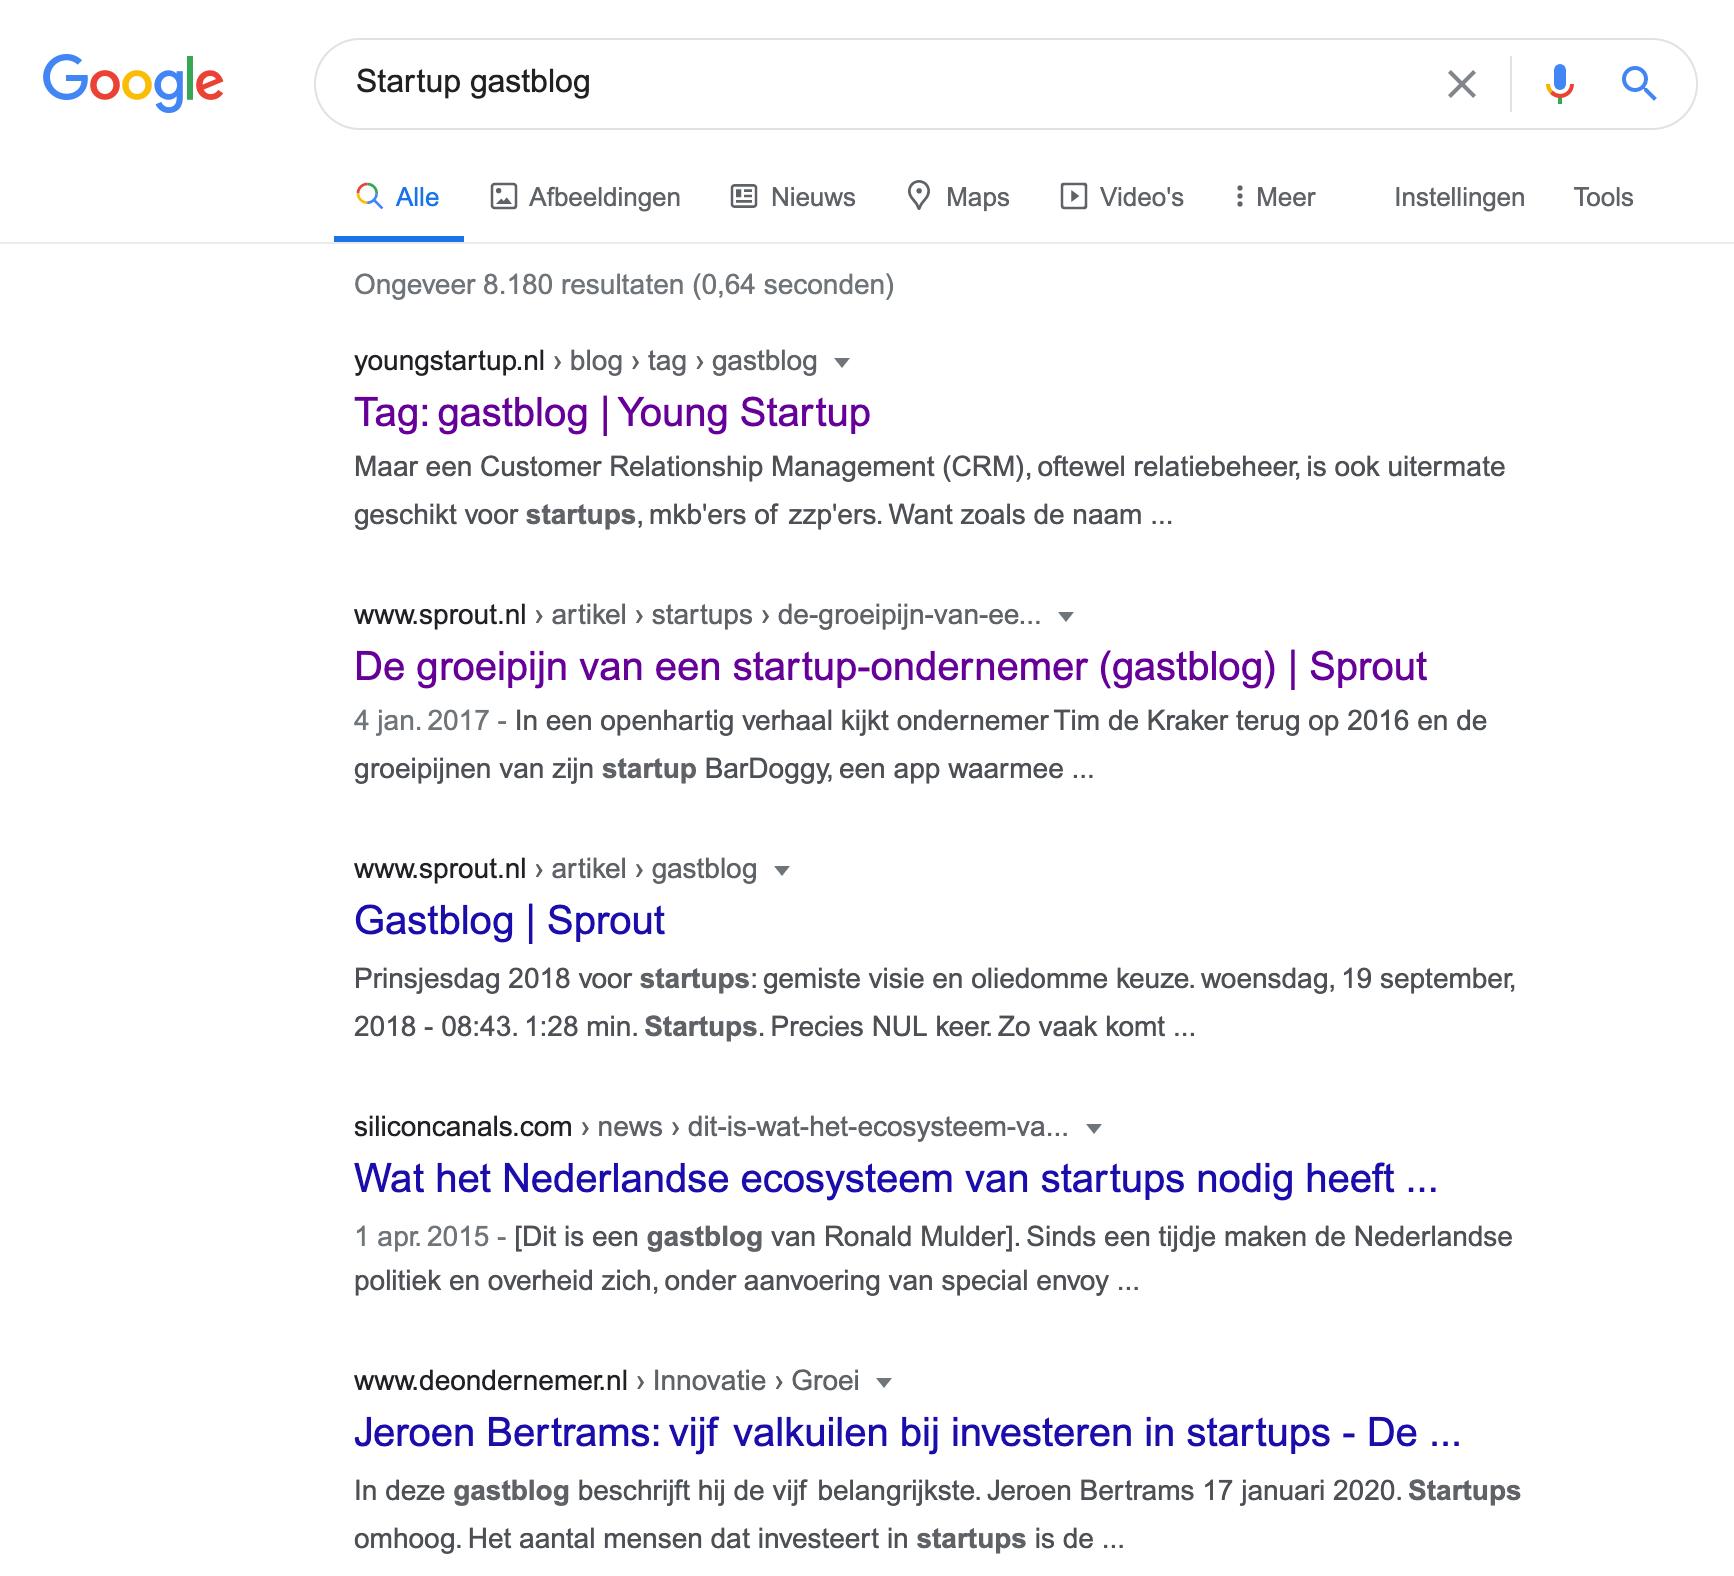 Startup gastblog zoekresultaten op Google